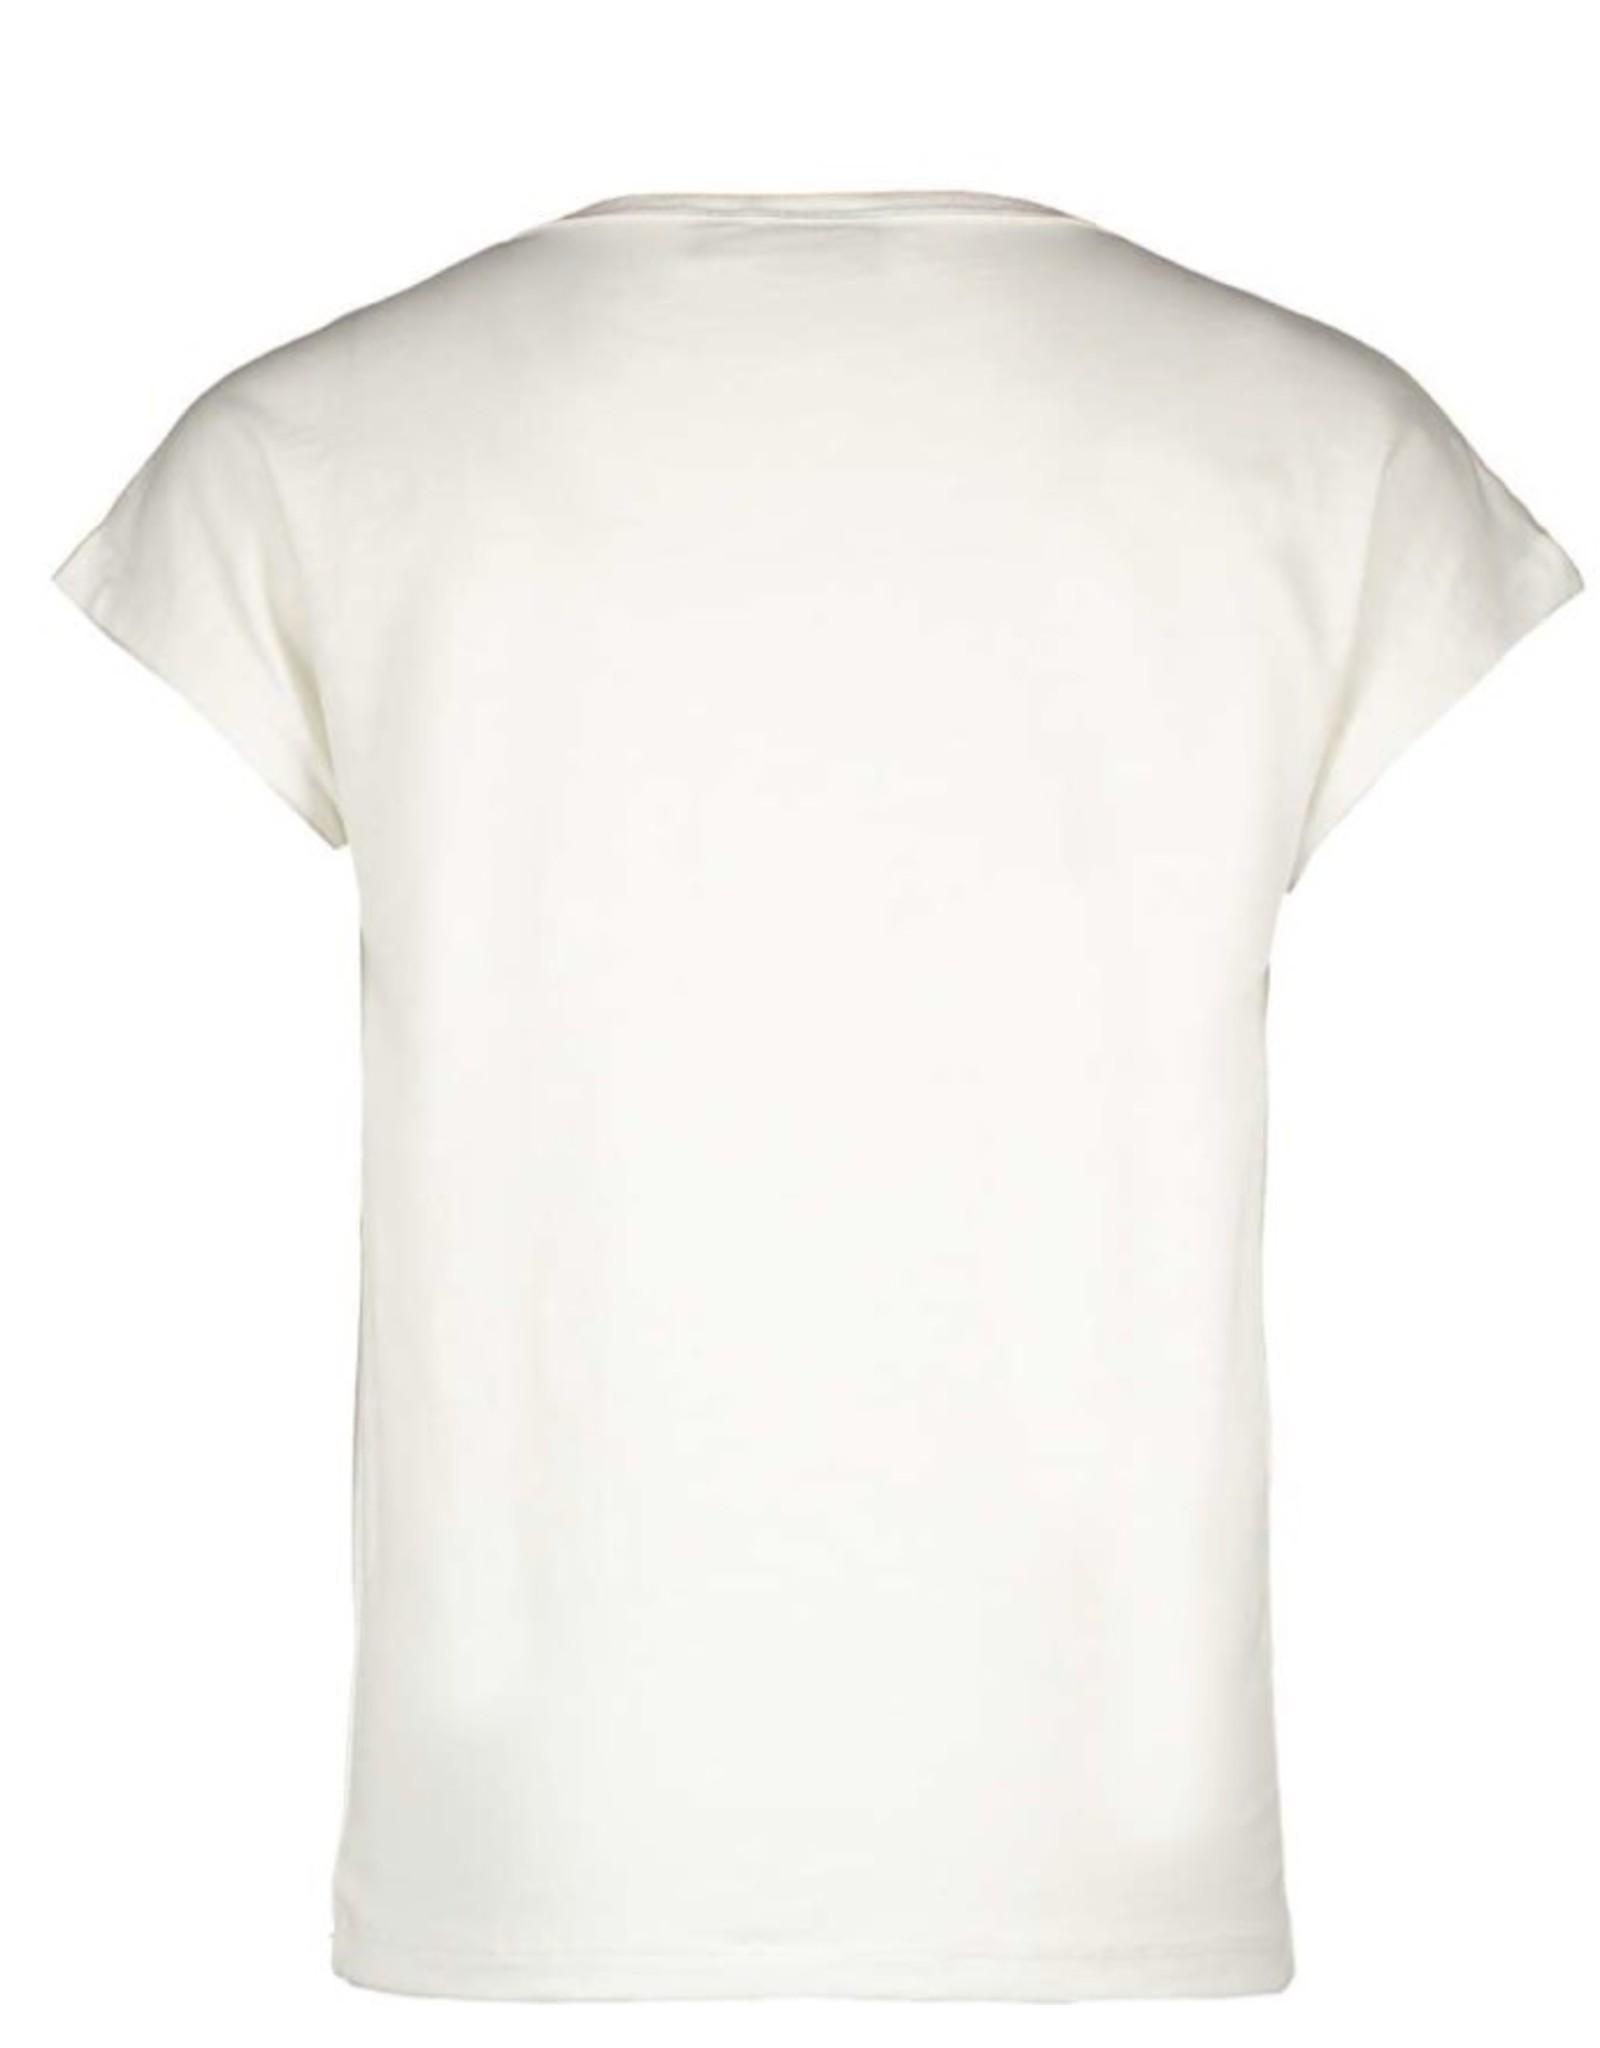 Flo F102-5440 T-Shirt